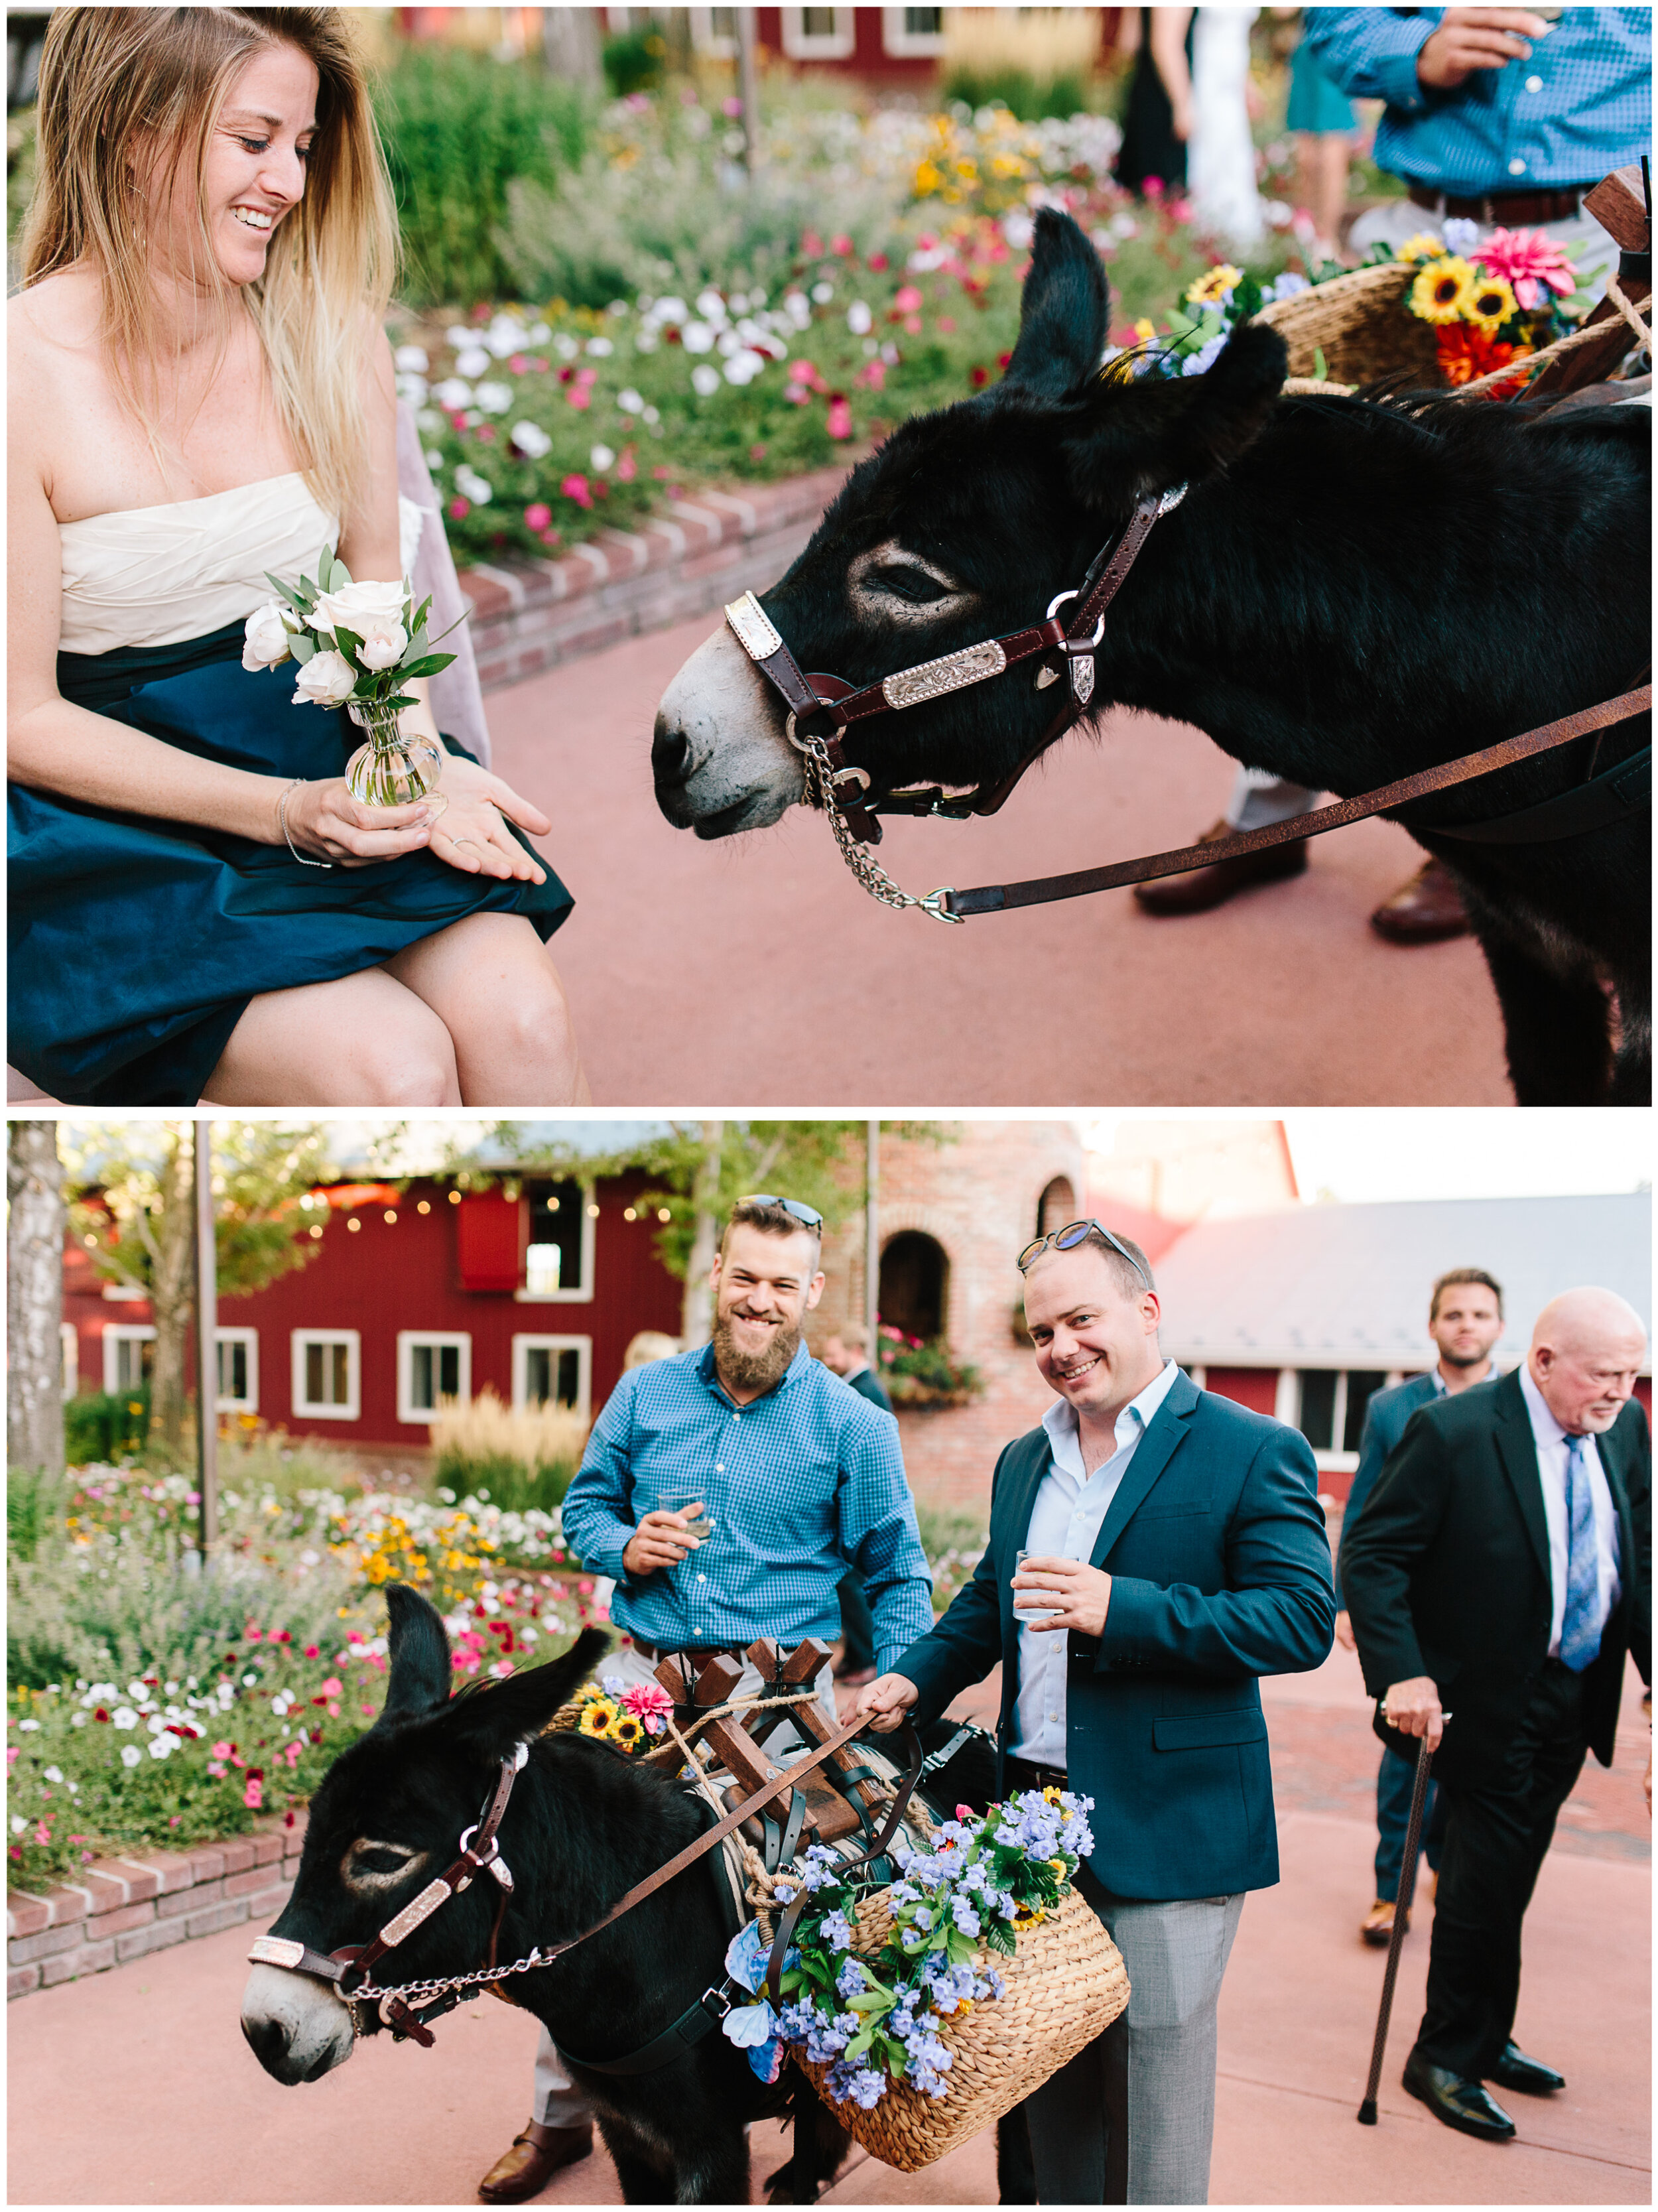 larkspur_colorado_wedding_58.jpg